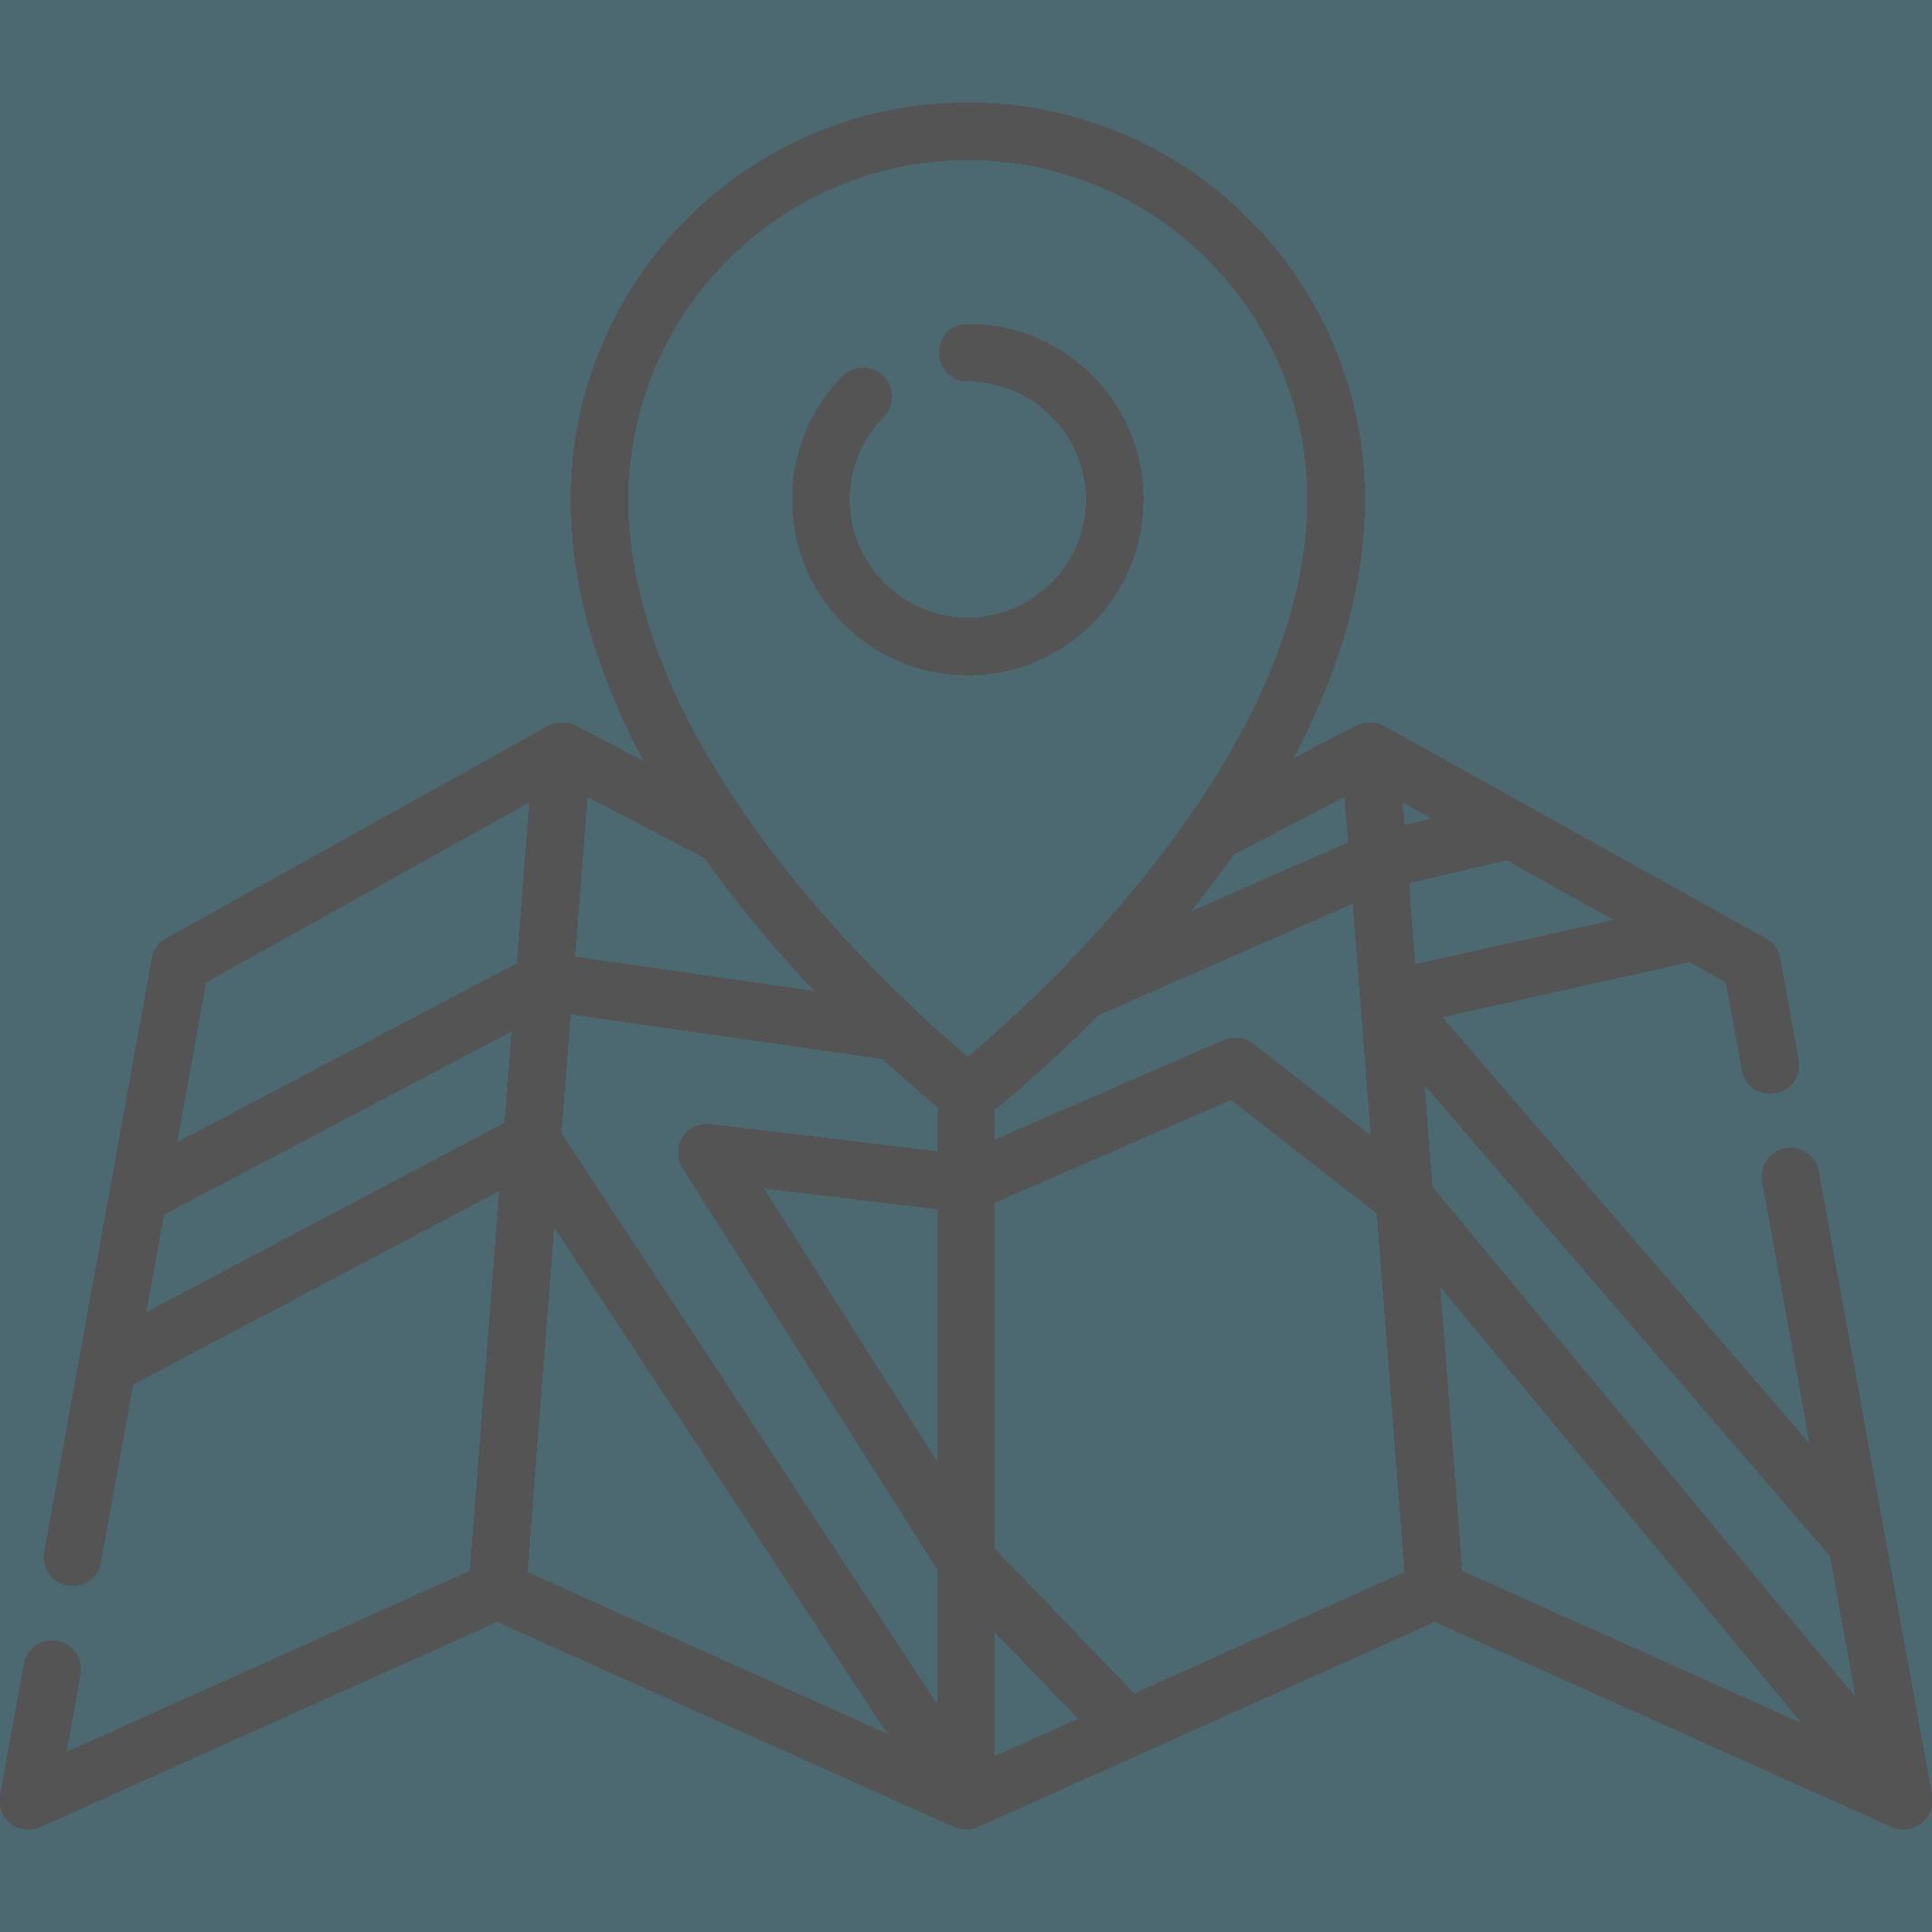 Spa Suite-Home de Briançon Serre-Chevalier - Chambre Spa Suite-Home de Briançon Serre-Chevalier - Centre ville